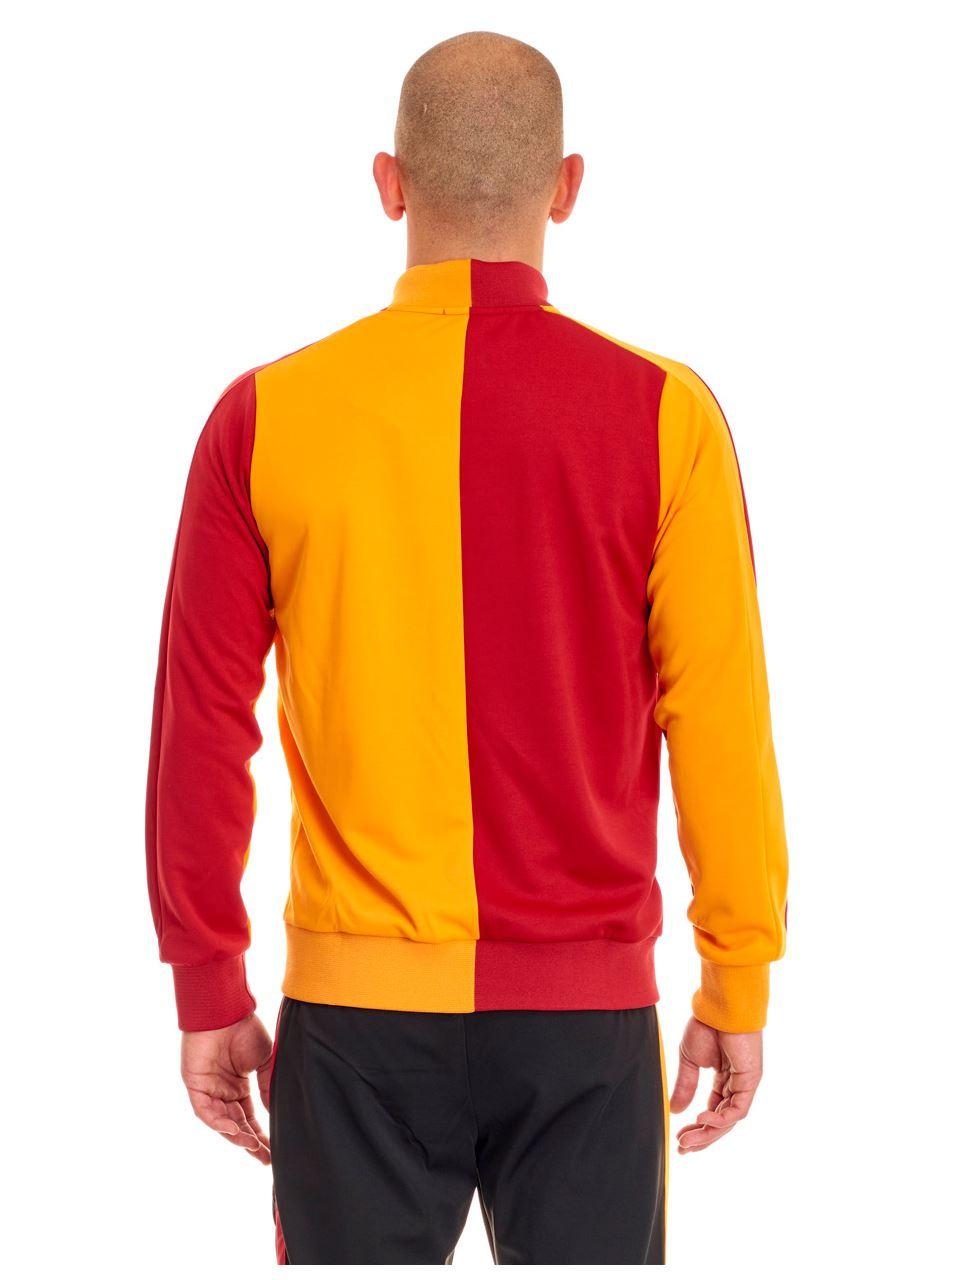 Galatasaray Taraftar Erkek Ceket E191224